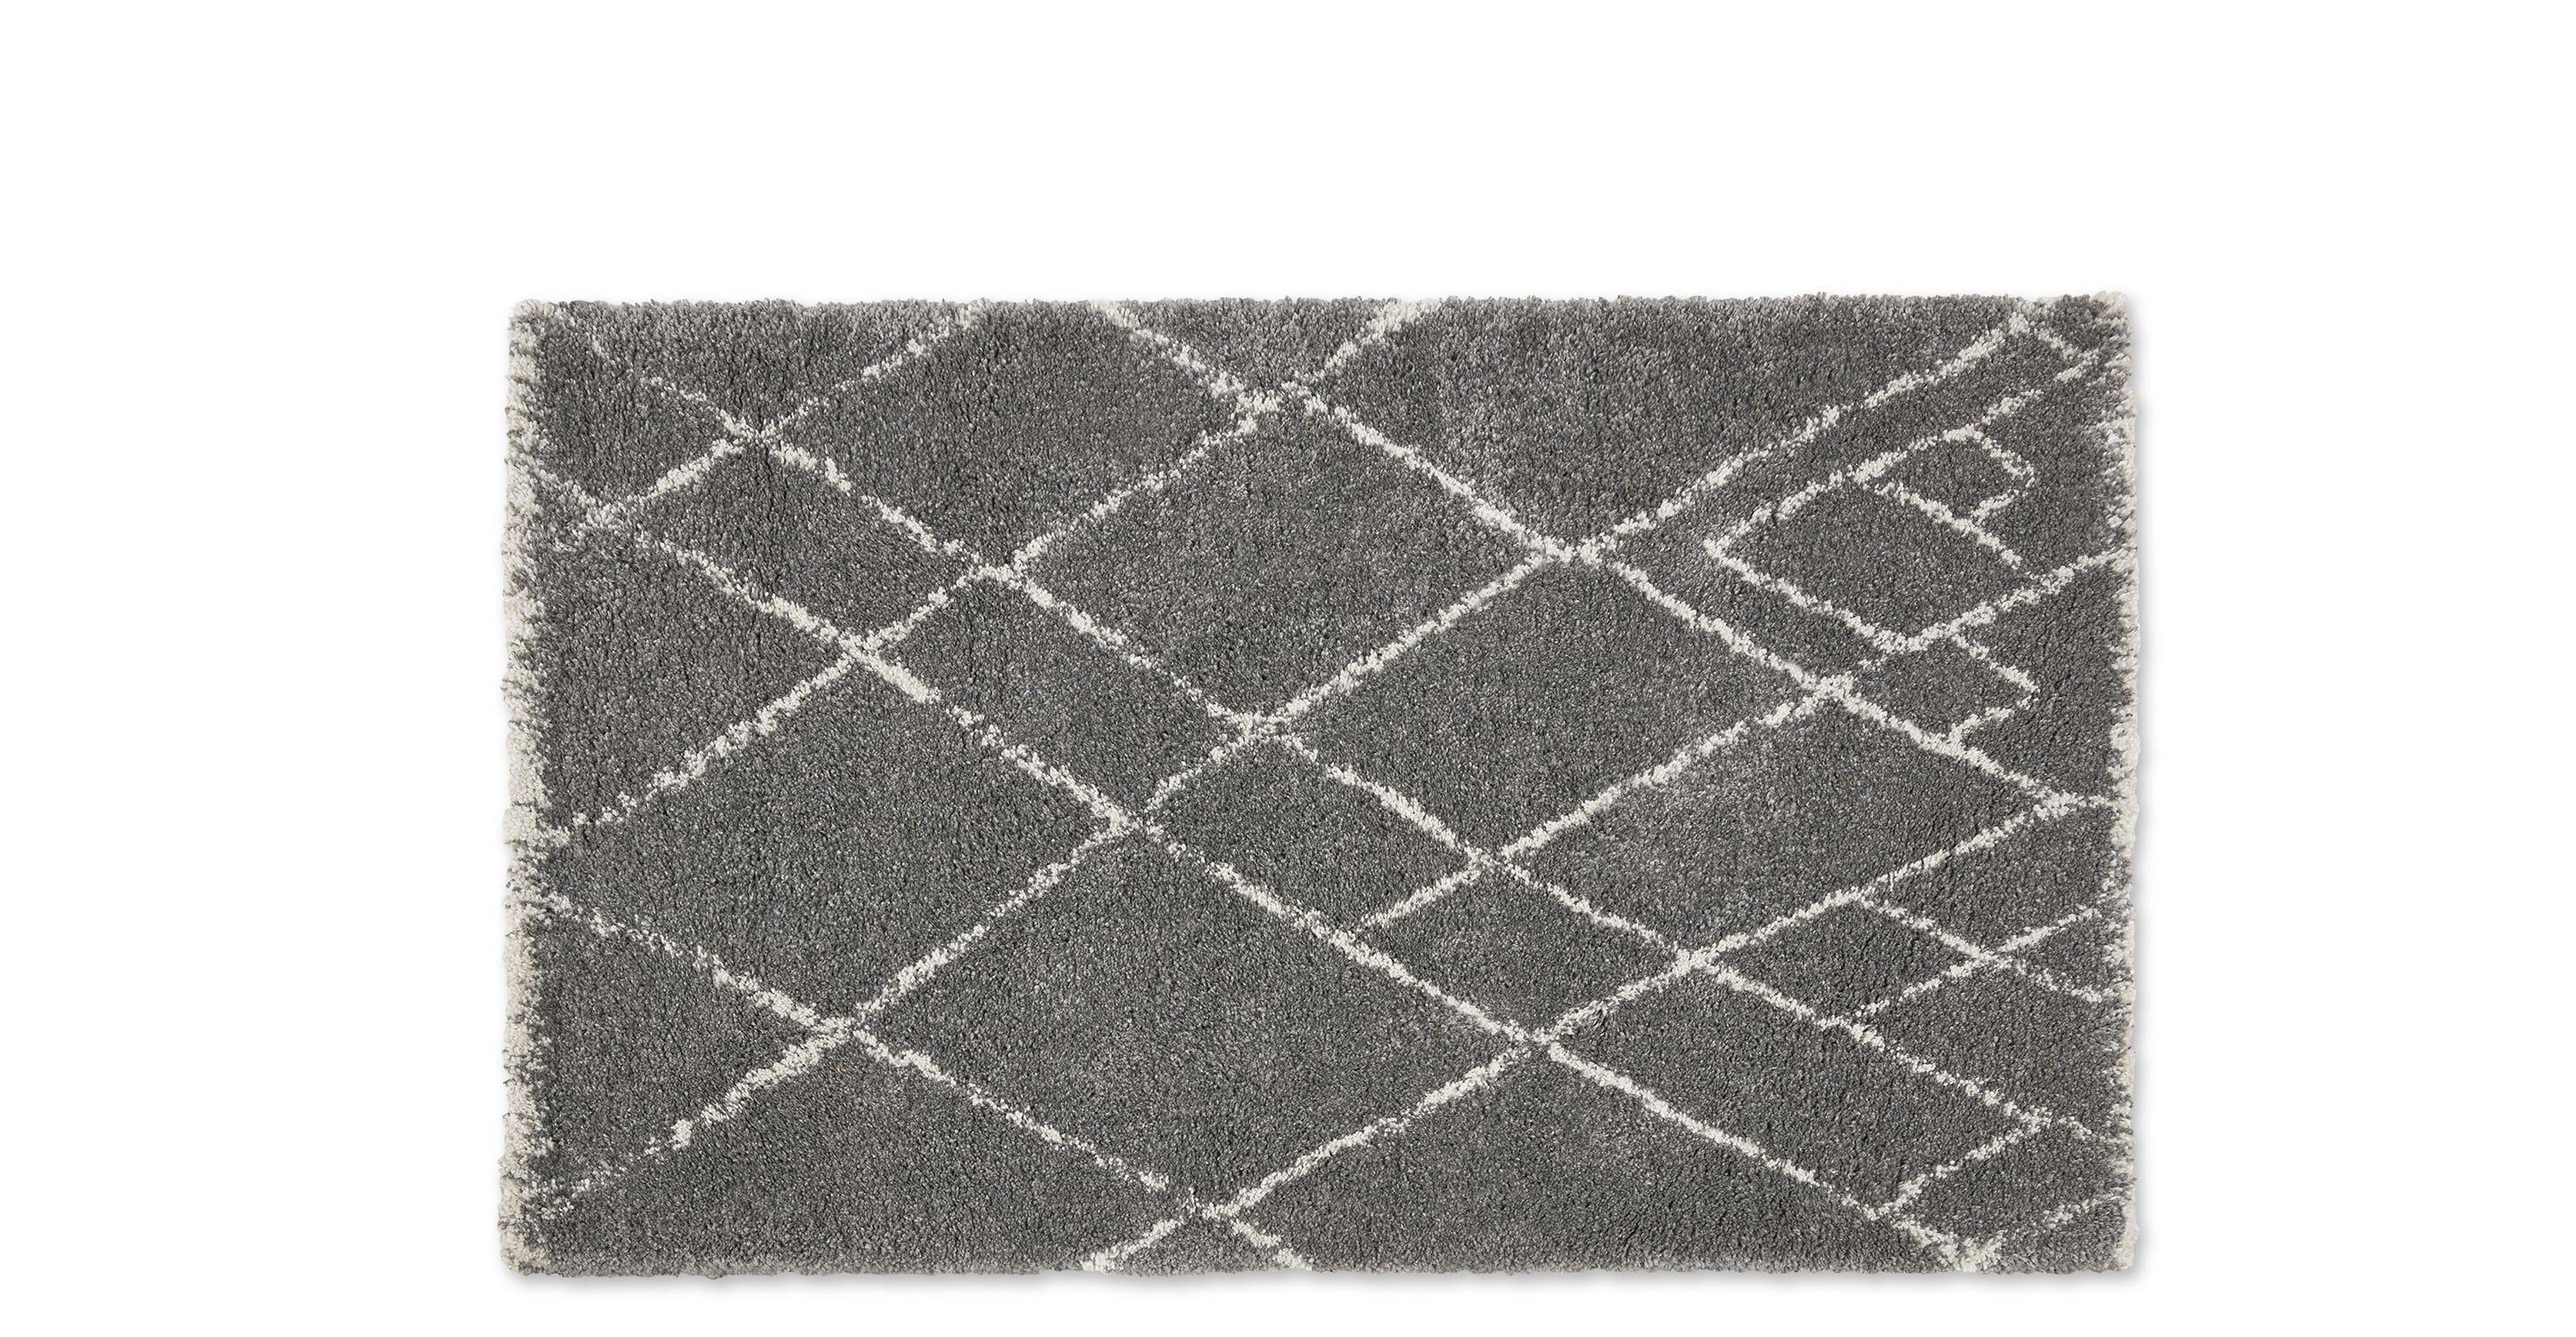 Teppich Berber Casa Berber Teppichboden Sisal Teppich 200x300